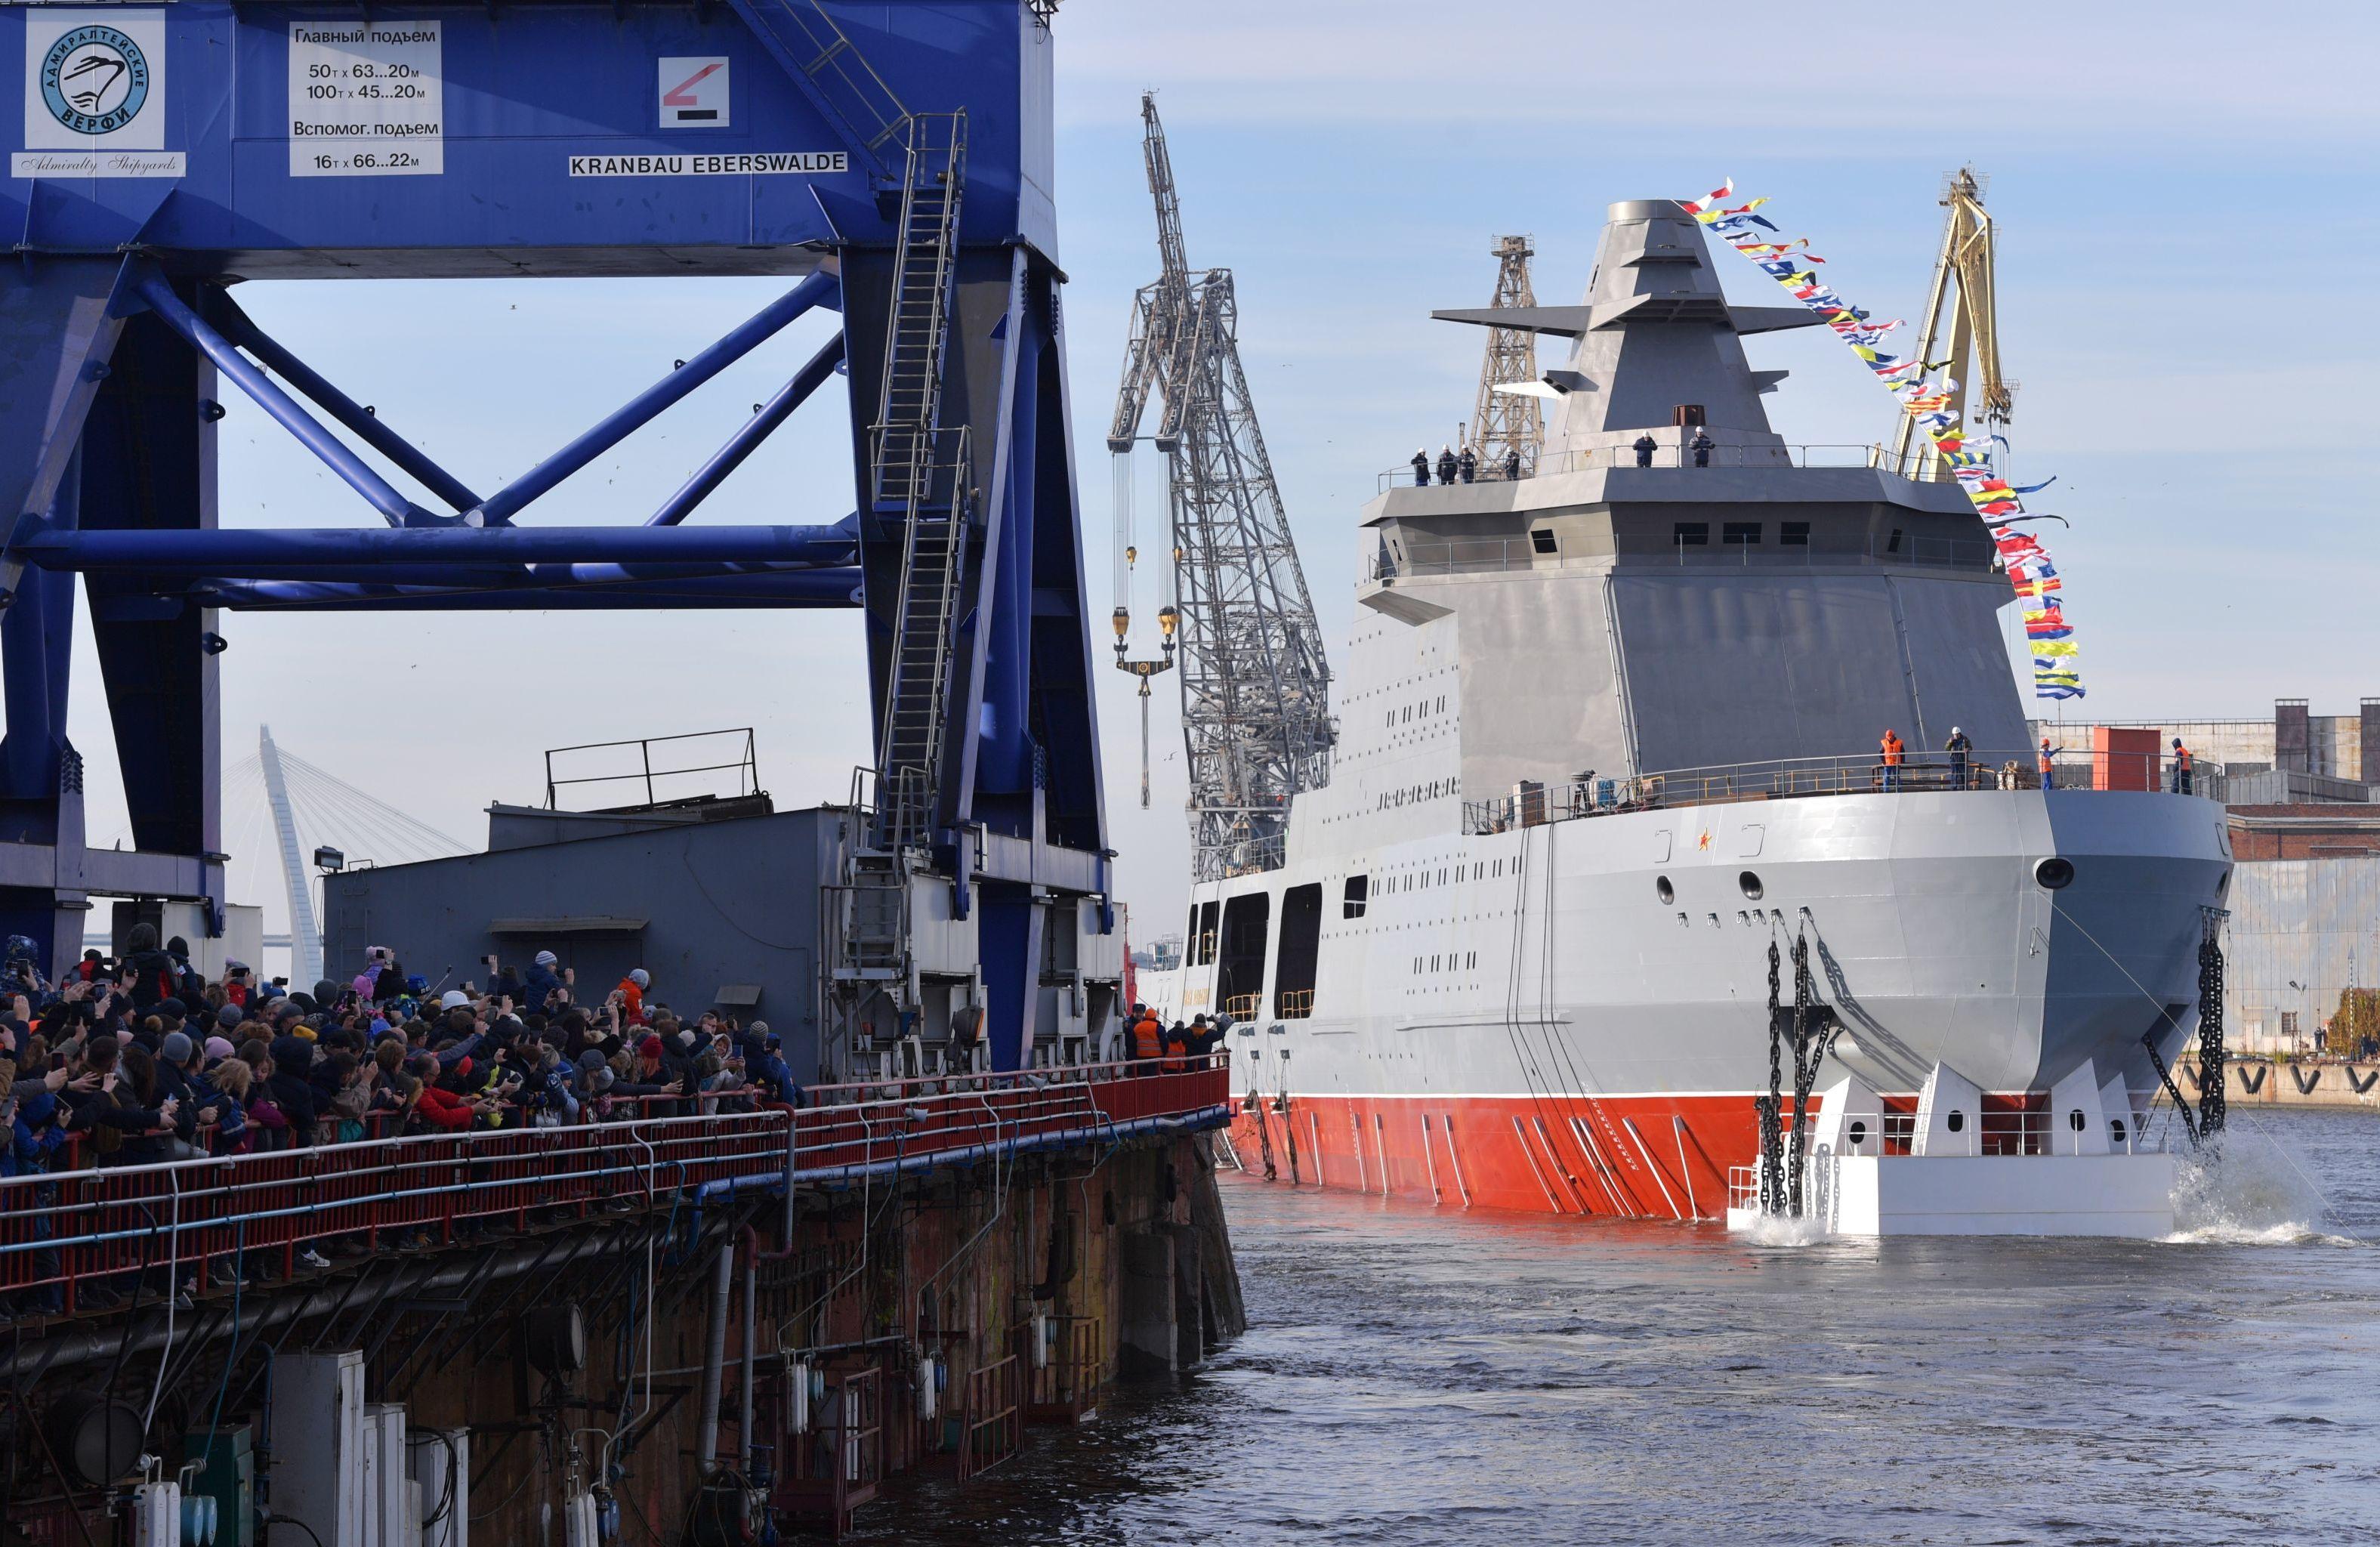 Wodowanie okrętu Iwan Papanin w Petersburgu